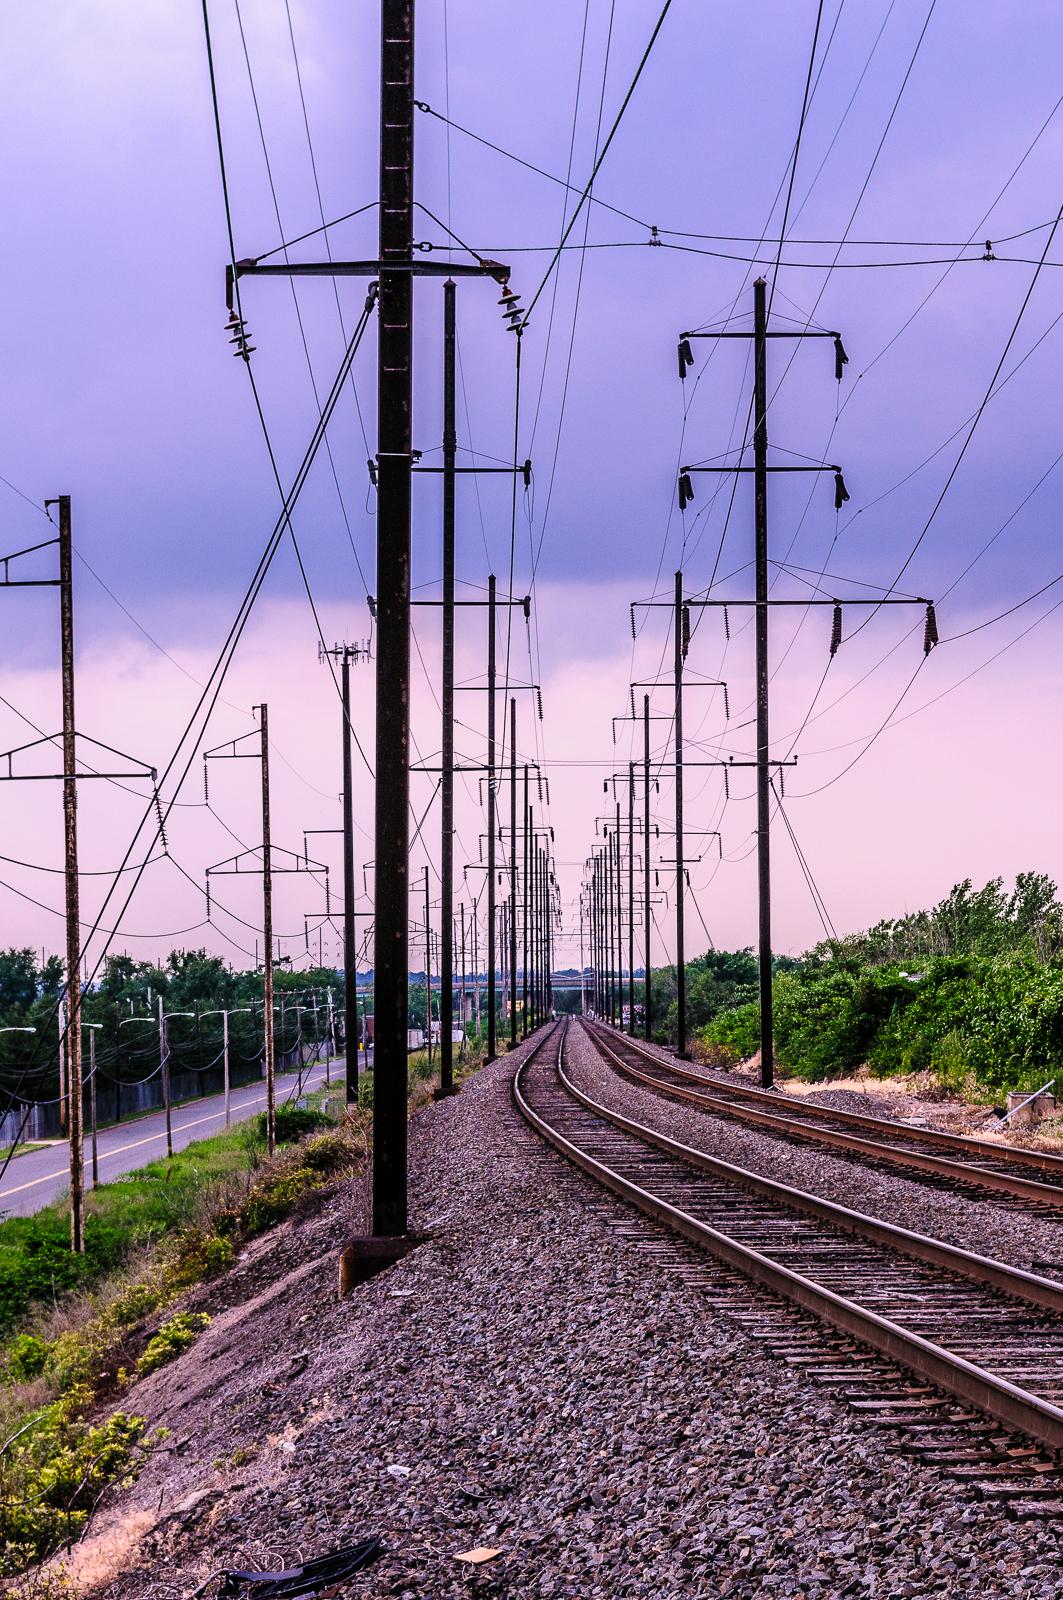 train-tracks-8945